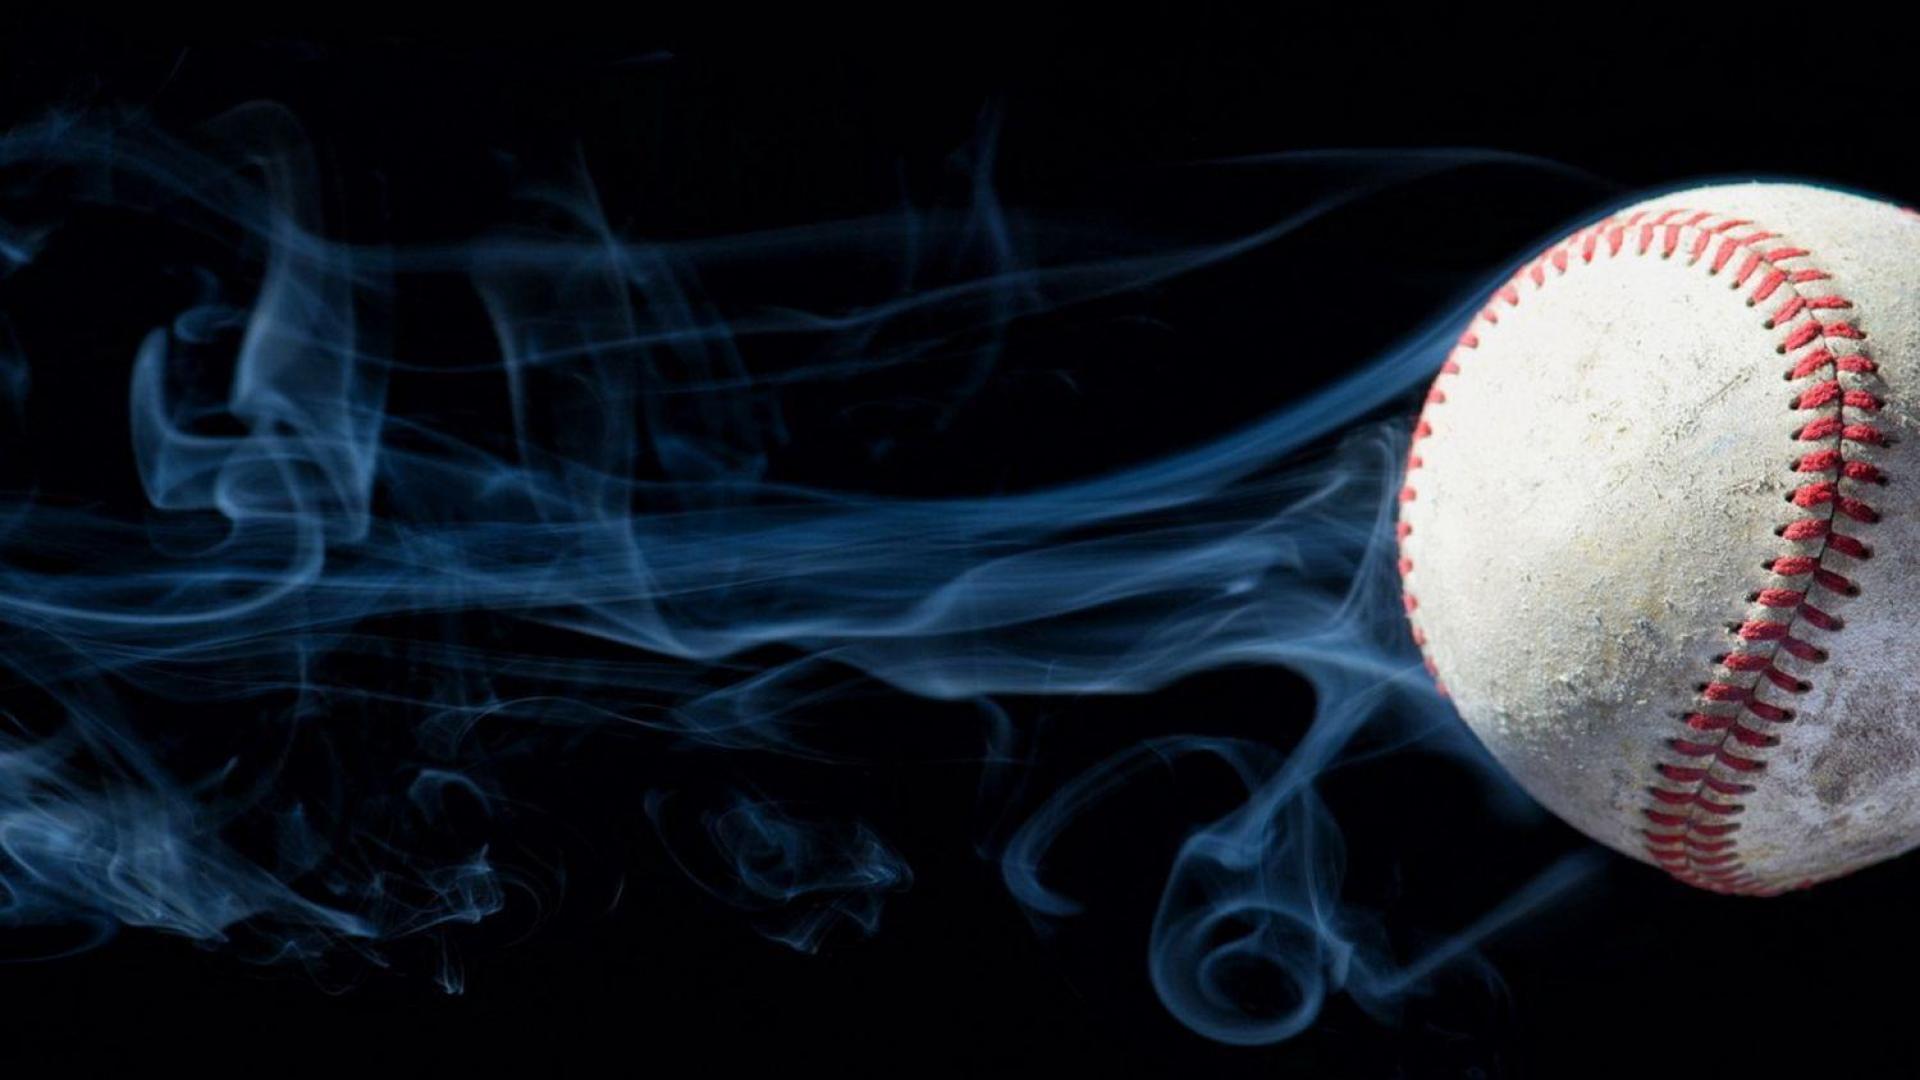 Baseball   120431   High Quality and Resolution Wallpapers on 1920x1080